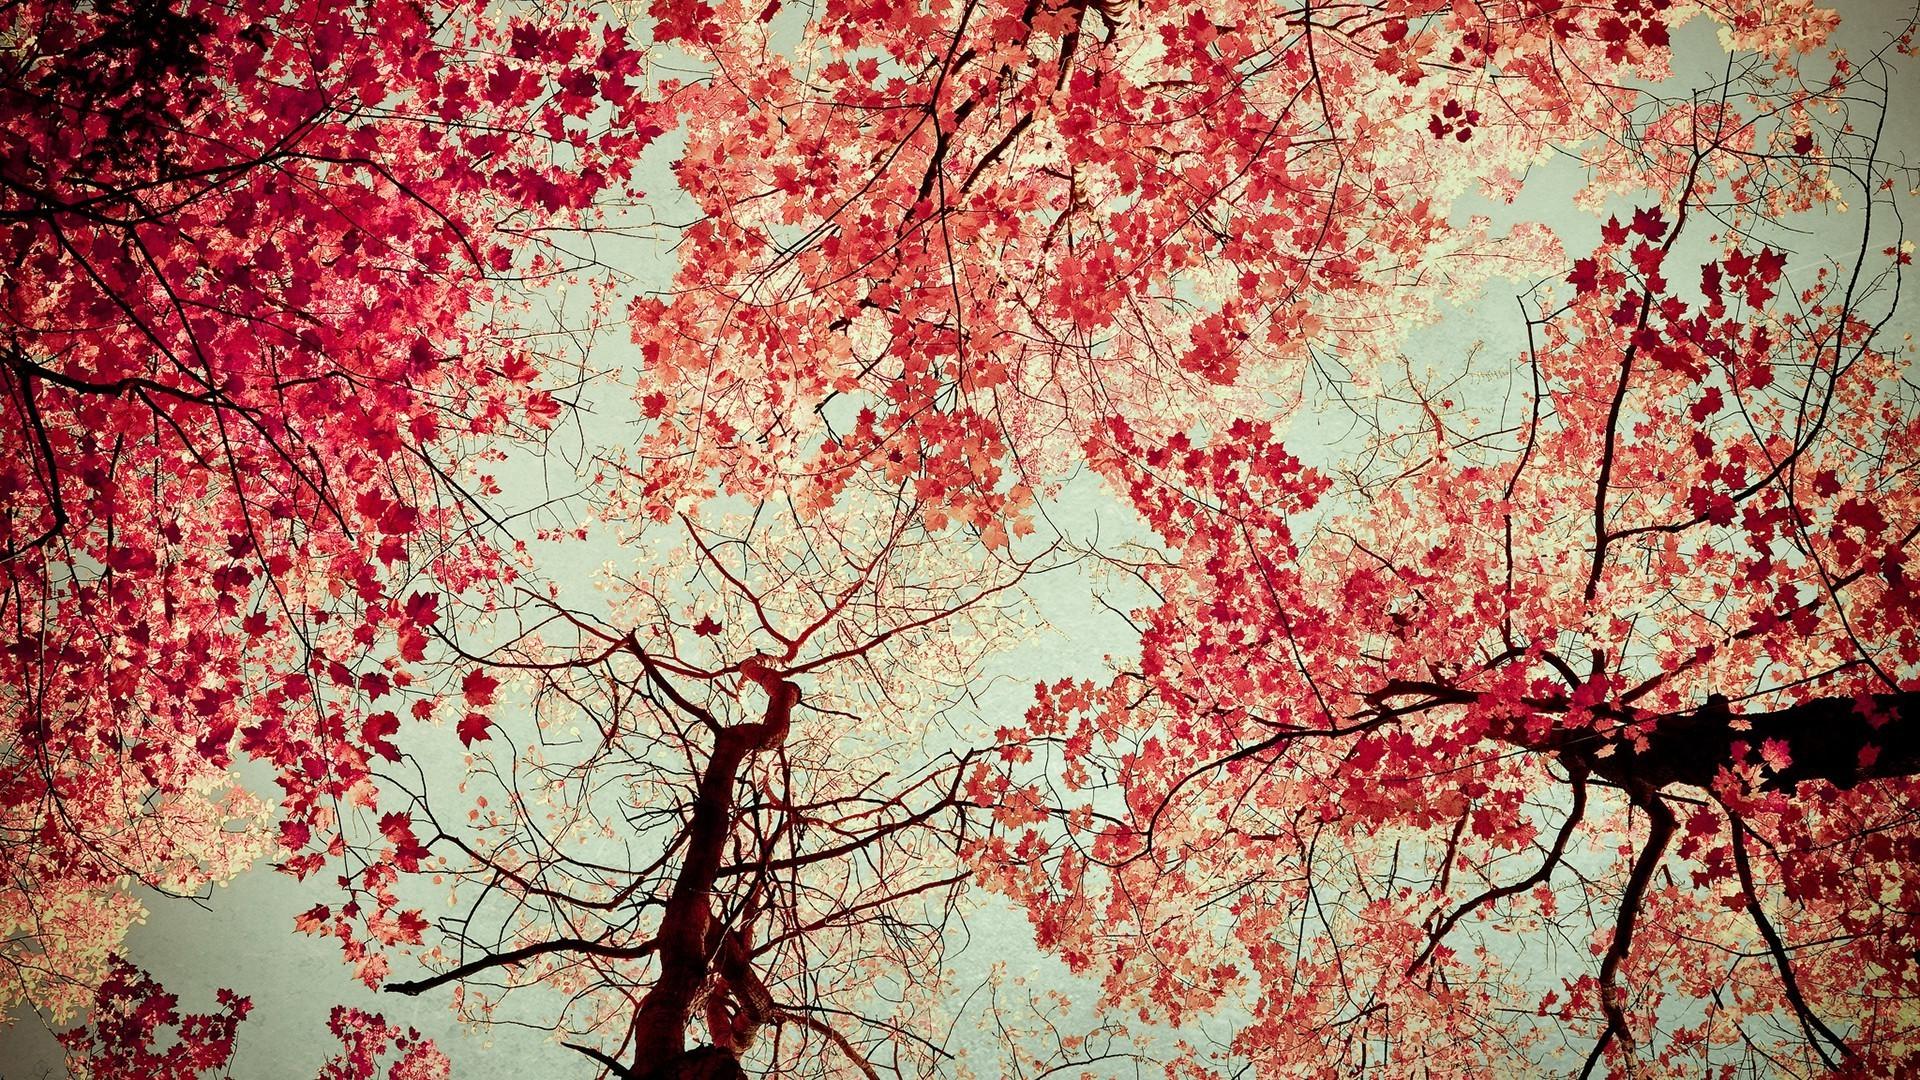 Fondos de pantalla rboles oto o naturaleza rojo - Plantas de temporada primavera ...